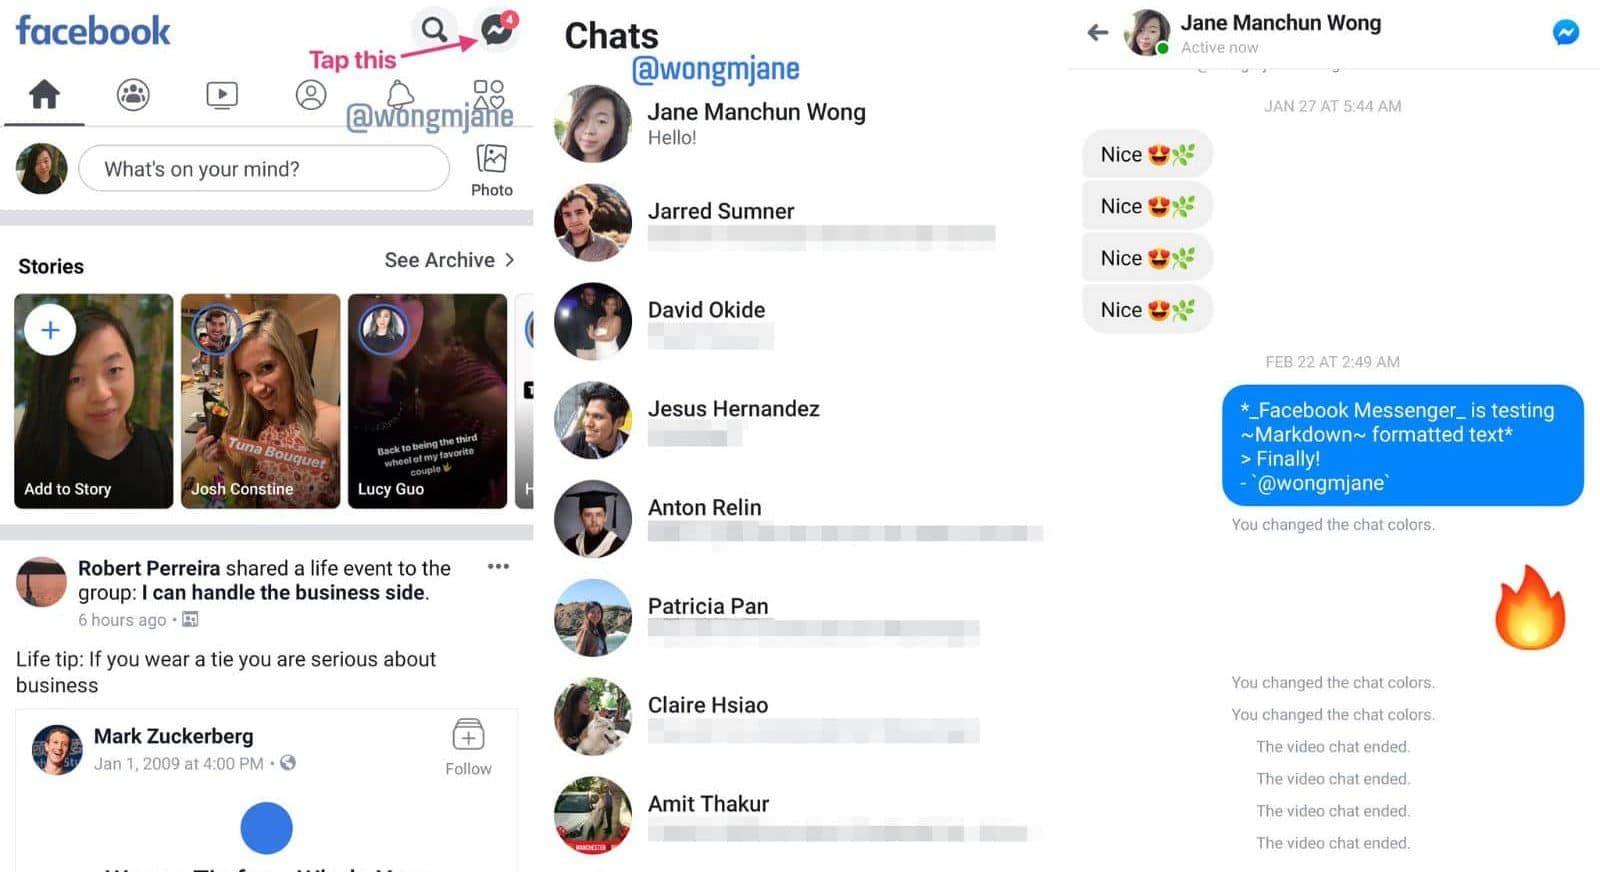 facebook messenger shown inside the main app